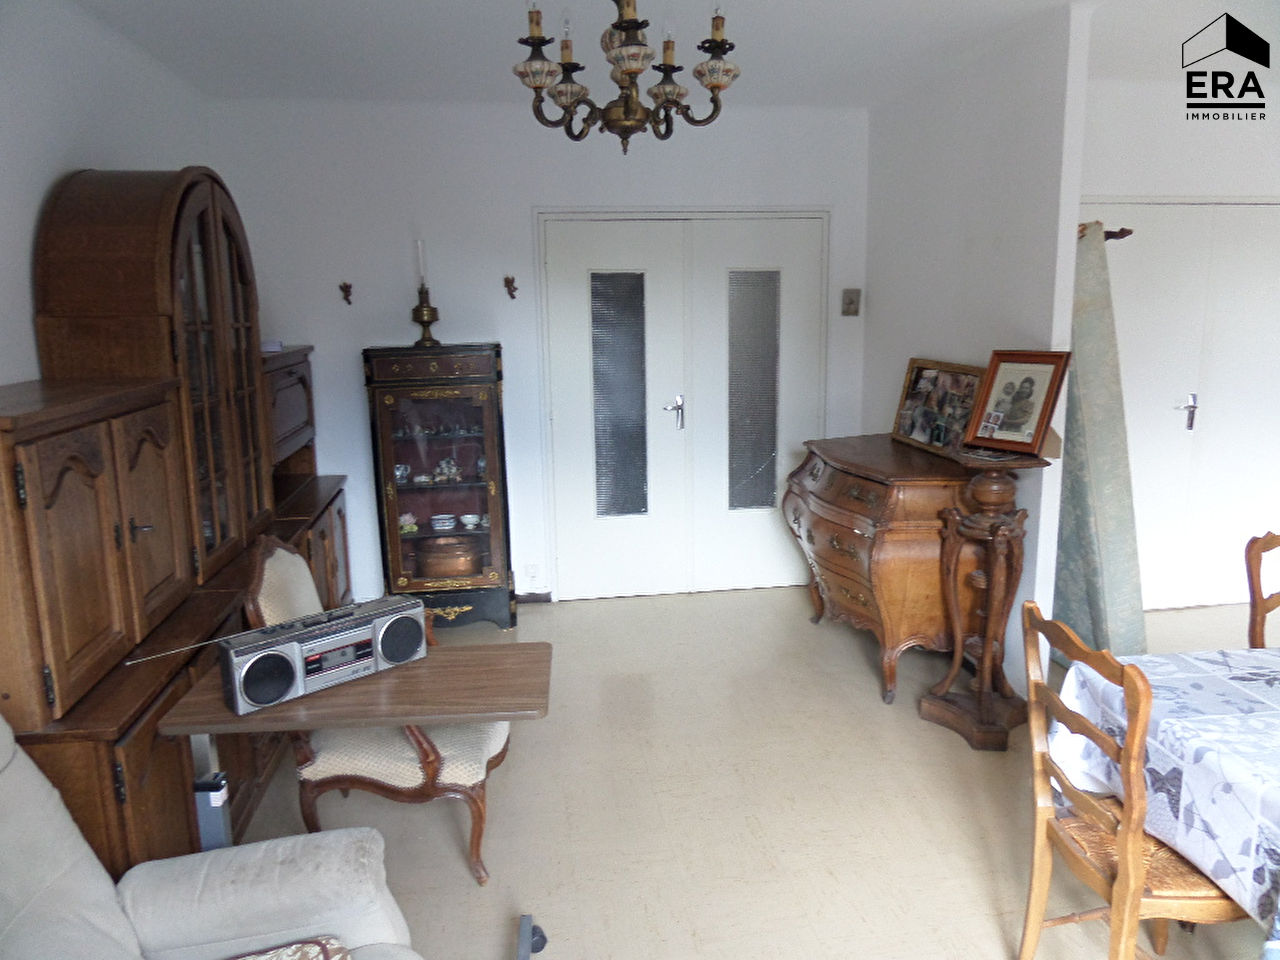 la torse appartement t3 4 garage cave aix en provence centre ville pied aix en provence 13080. Black Bedroom Furniture Sets. Home Design Ideas